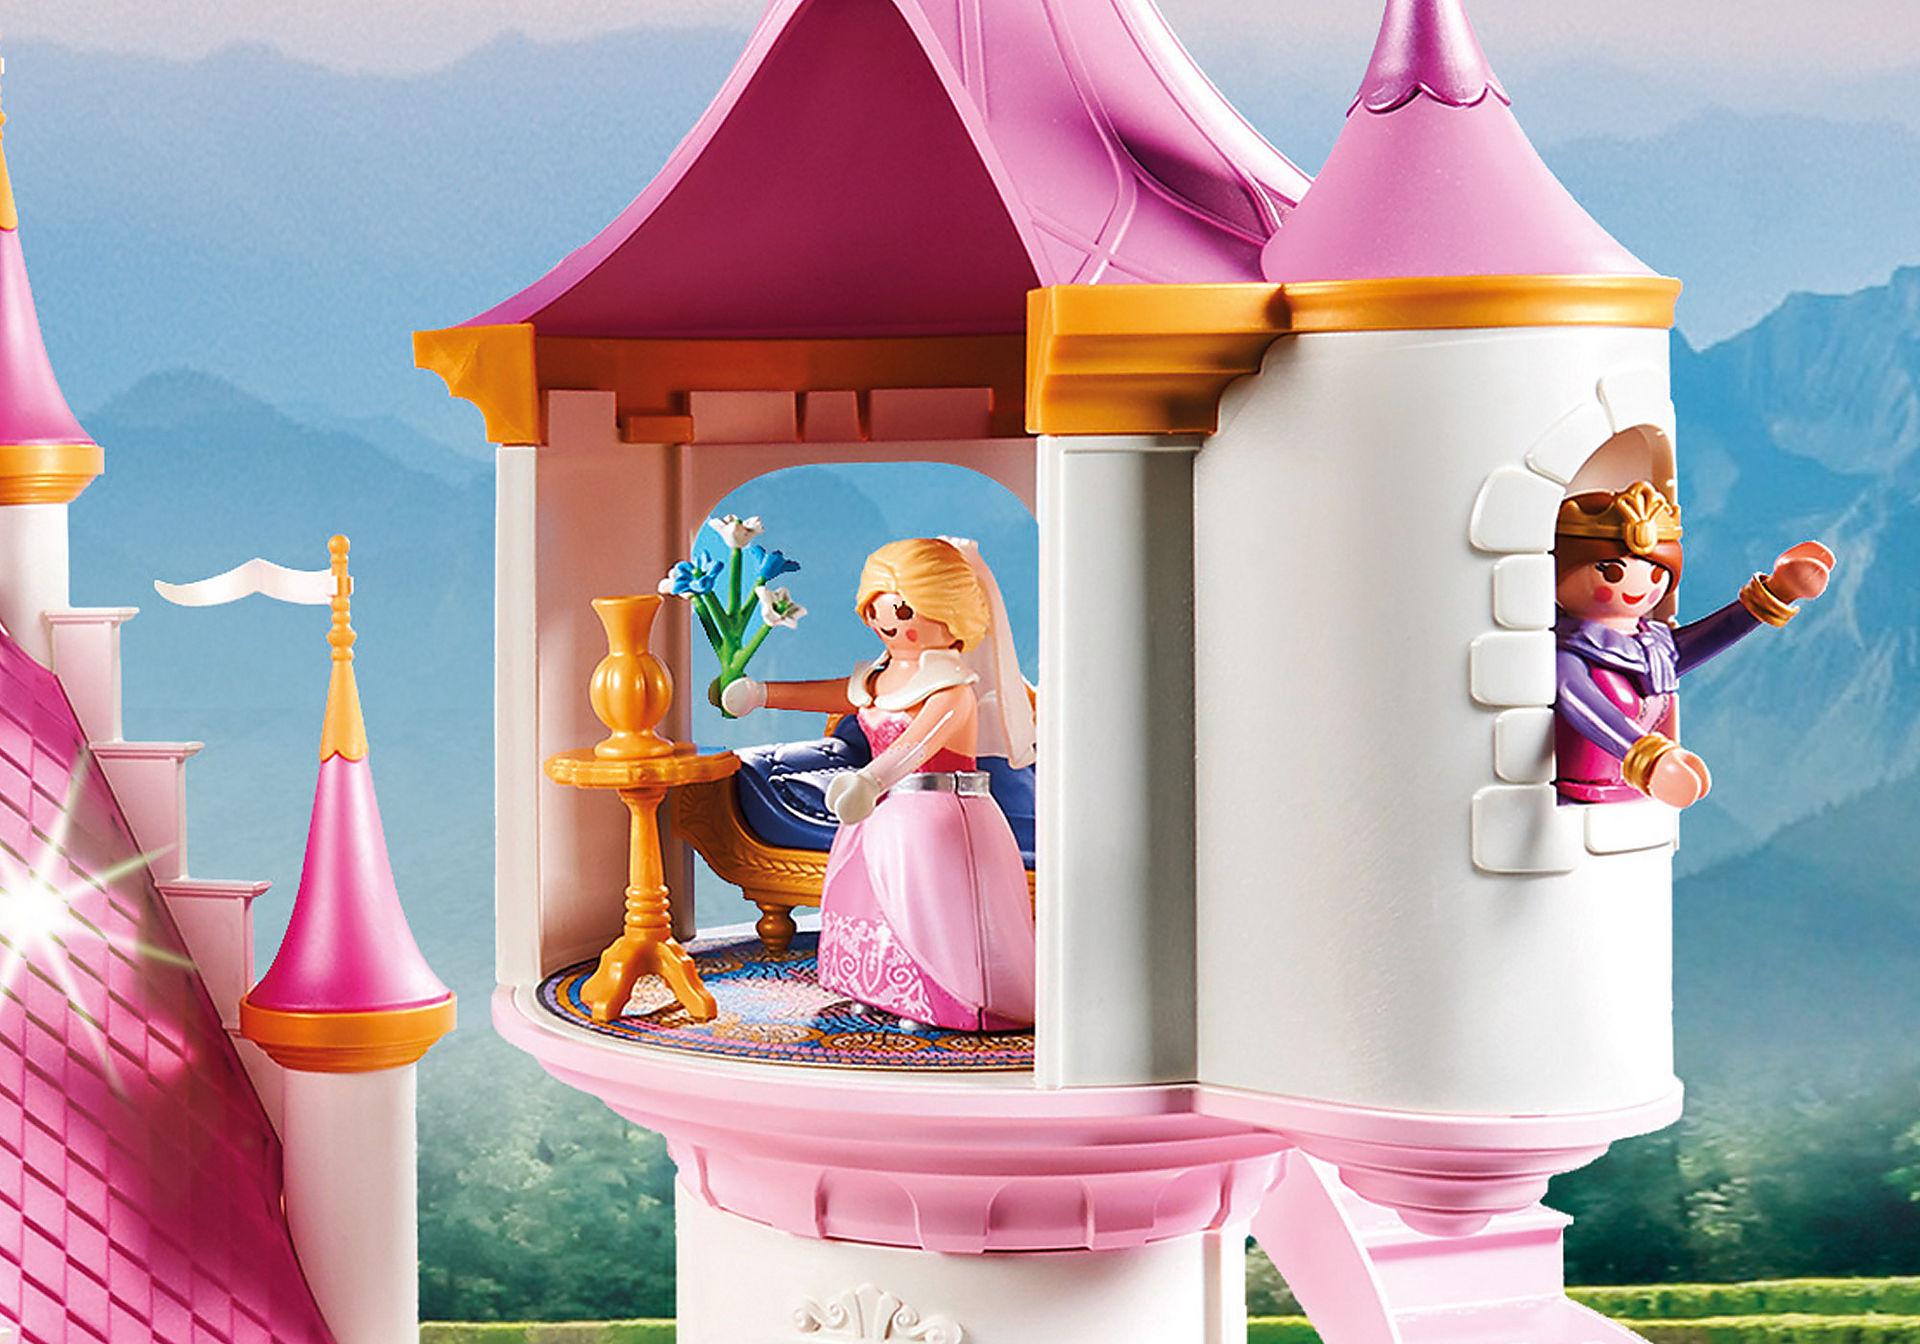 70447 Grande Castelo das Princesas zoom image9